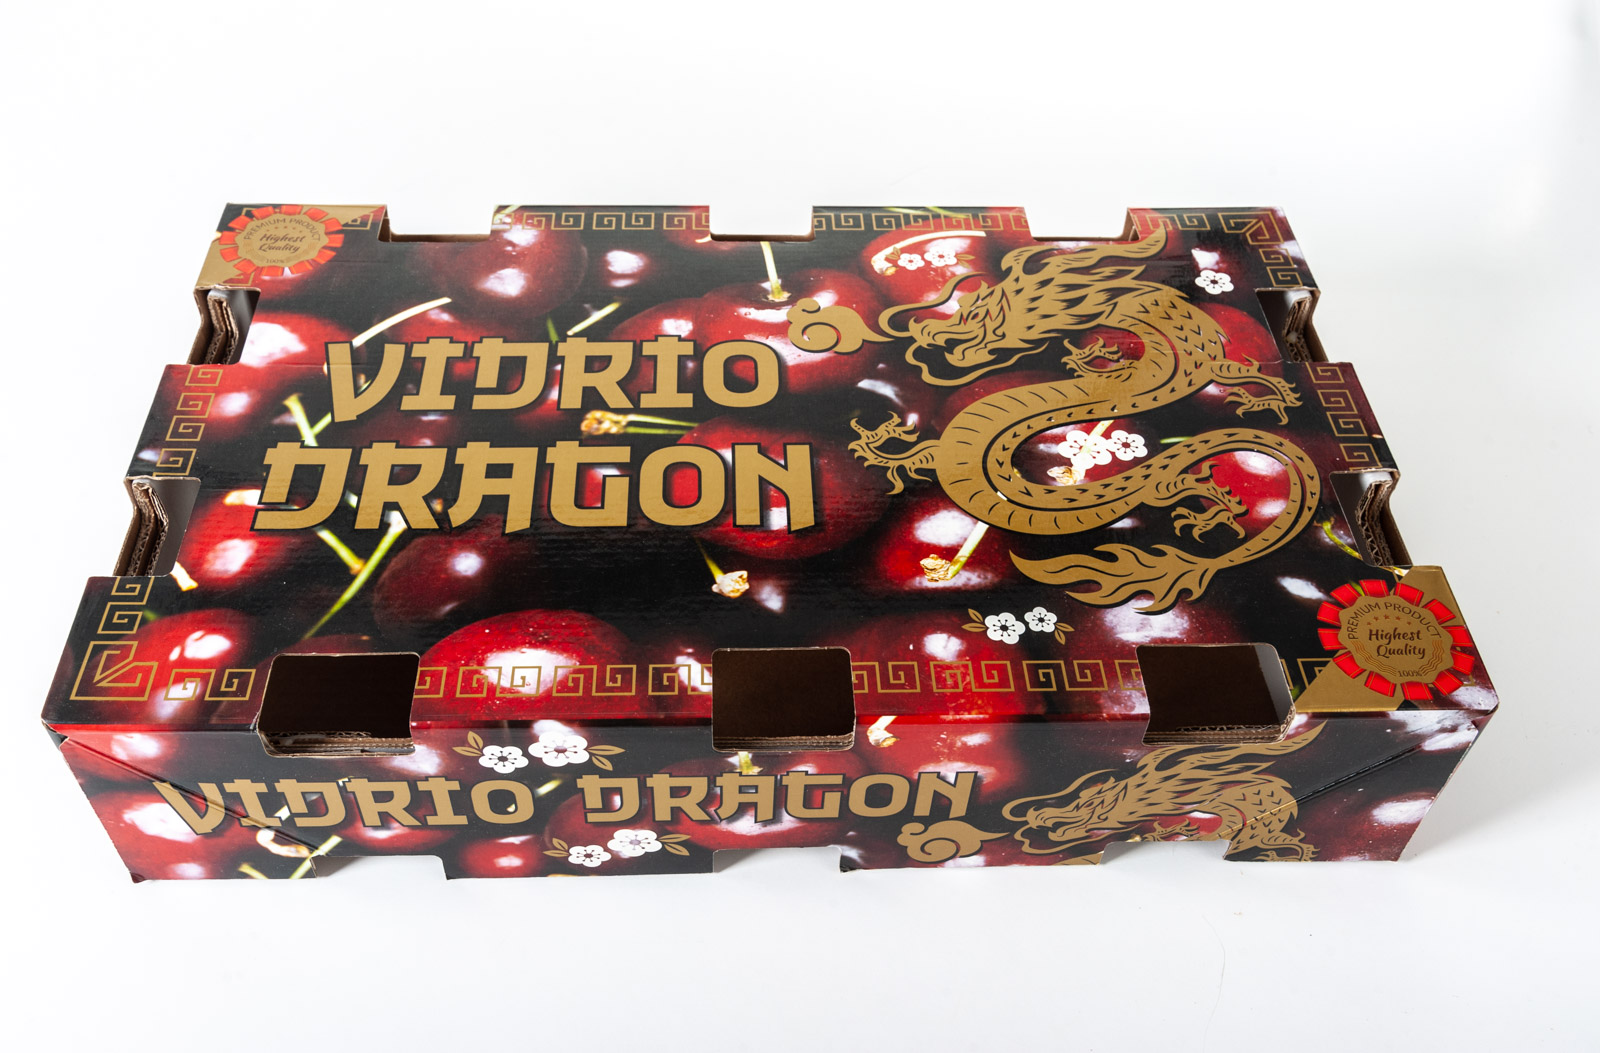 Diseño envase de cartón para Cerezas Vidrio Dragon exportación - Imagina Arte Gráfico